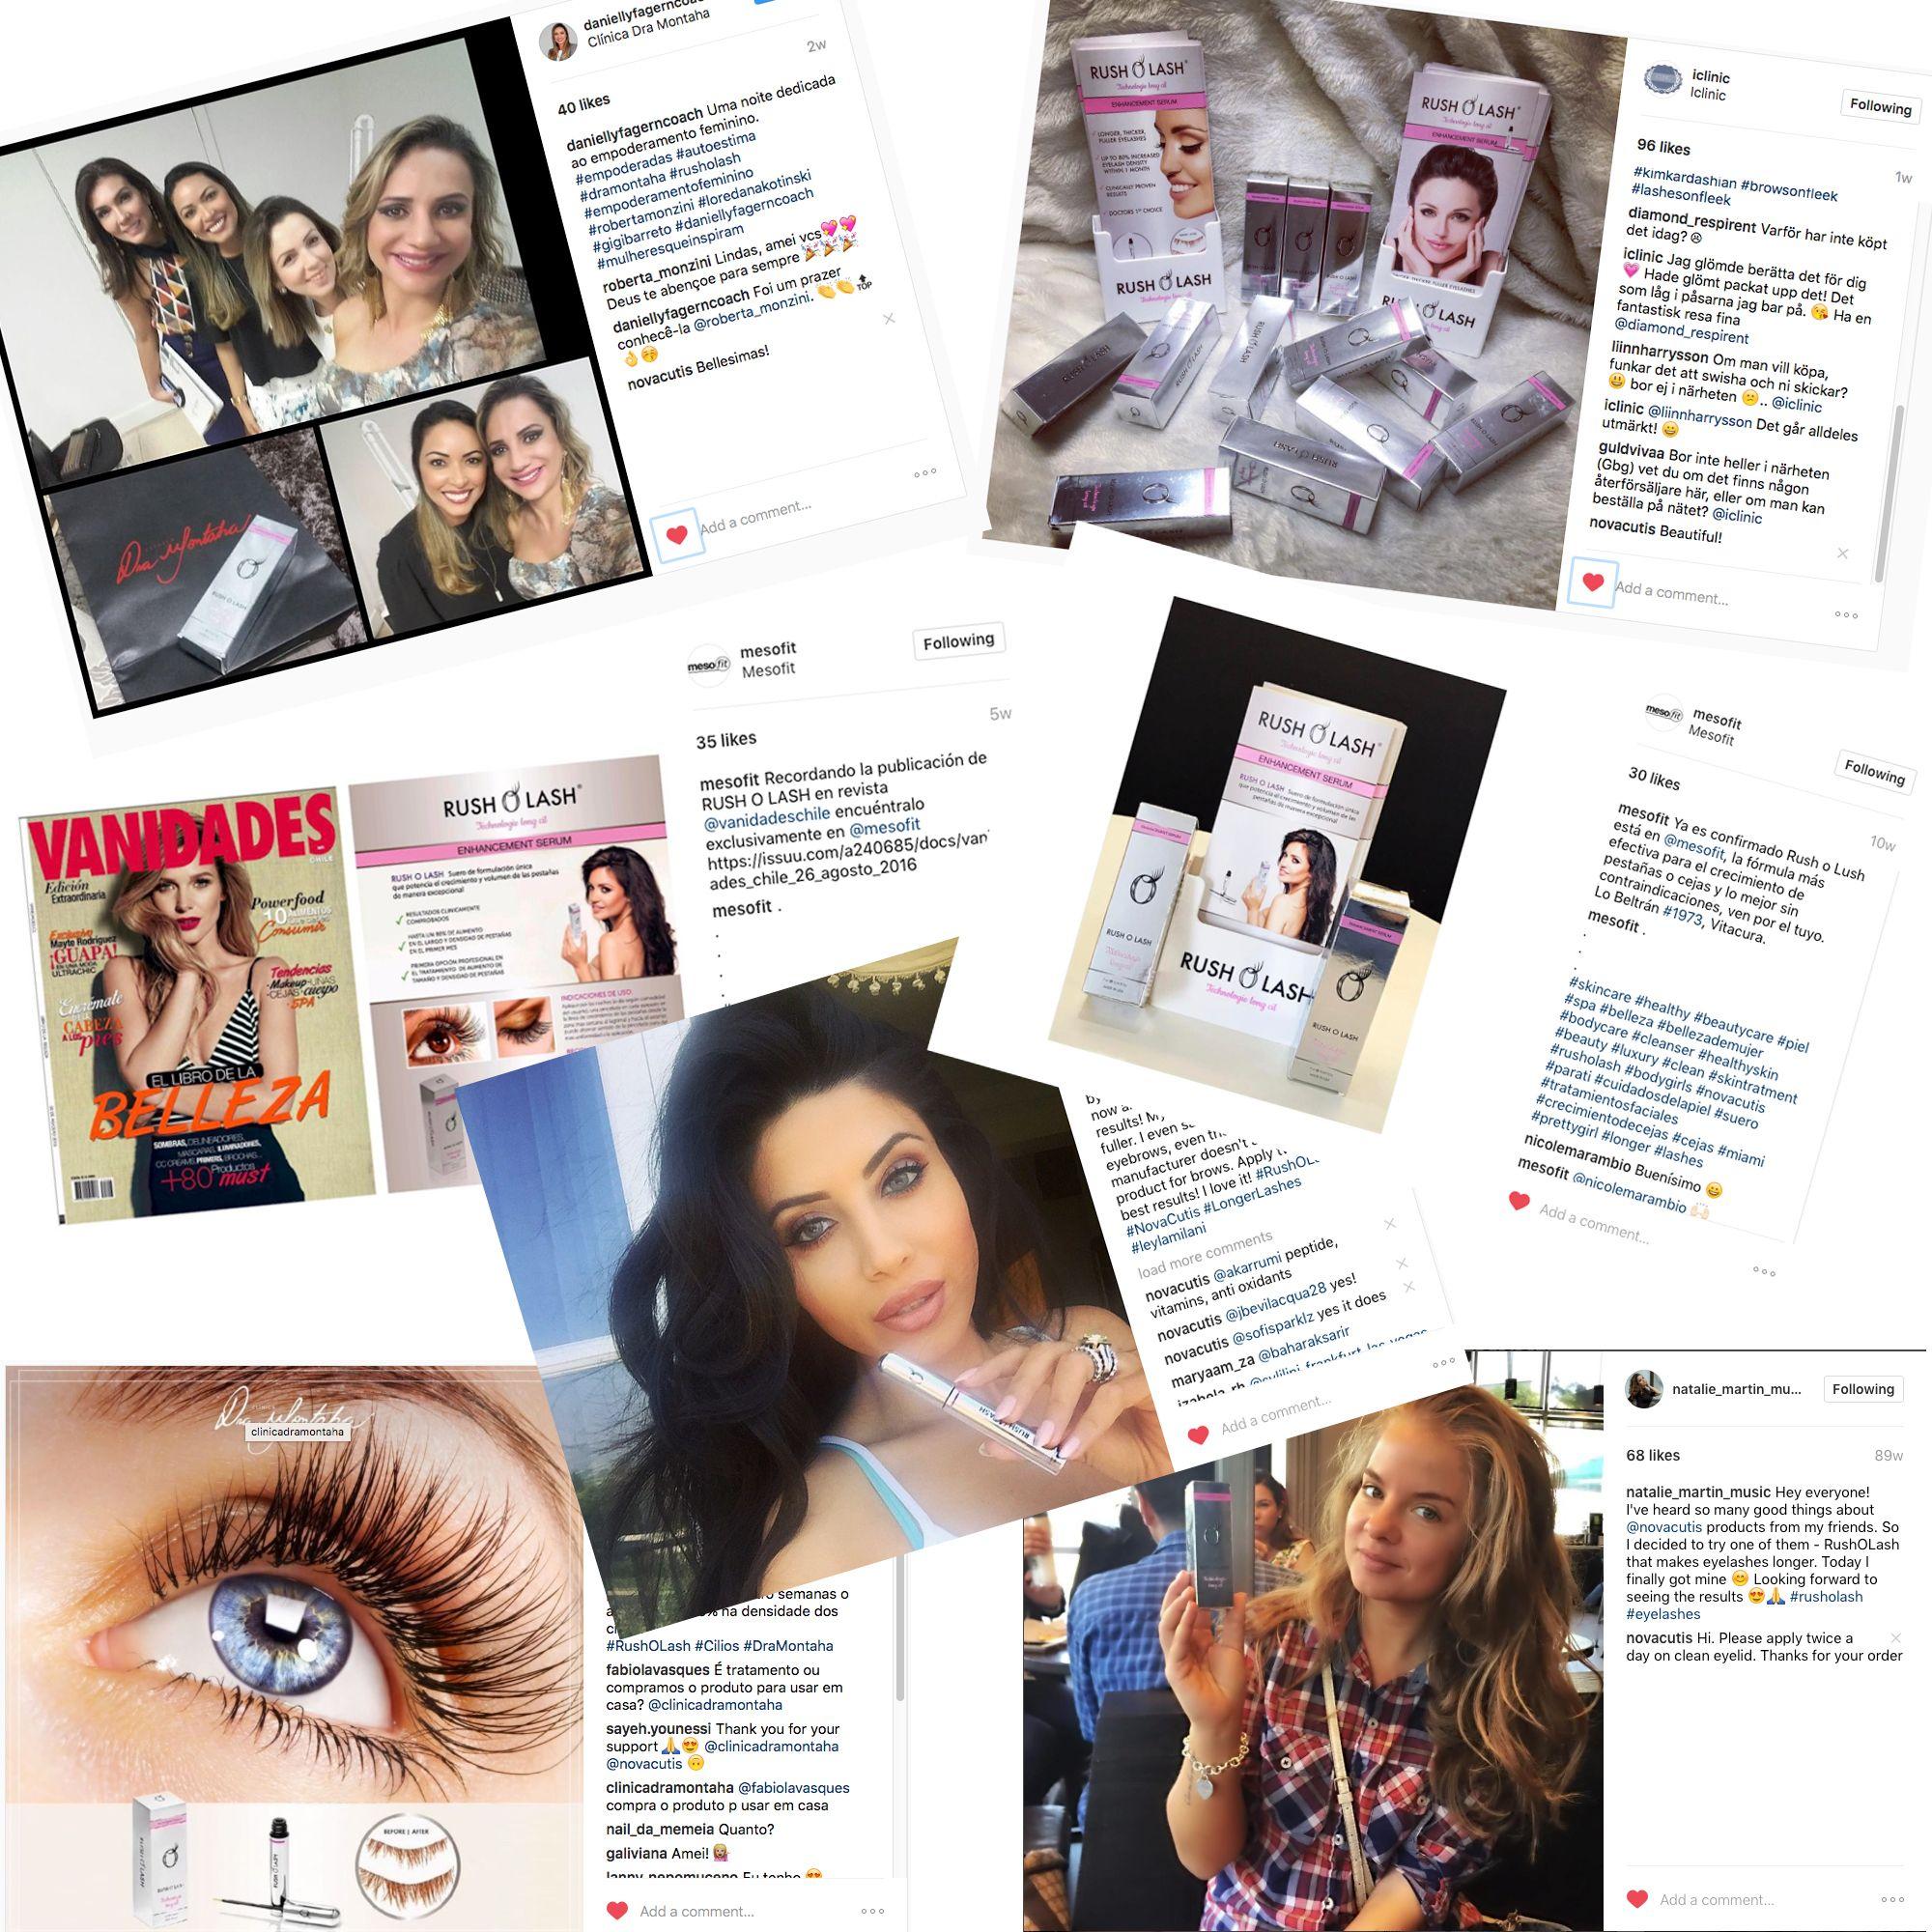 We love to see happy all Rush O Lash users worldwide! You can be part of our family. Share your pictures with us.   #novacutis #rusholash #rusholashfans #aestheticmedicine #beauty #cosmetics #eyelashes #eyelashserum #mesotherapy #makeup #antiage #aminoacids #hyaluronicacid #serumparapestañas #pestañas #pestañaslargas #cejas #cosmeticos #medicinaestetica #Schönheit #Natürlichkeit #Sanft #JugendlichesÄußeres #Hautstruktur #красота